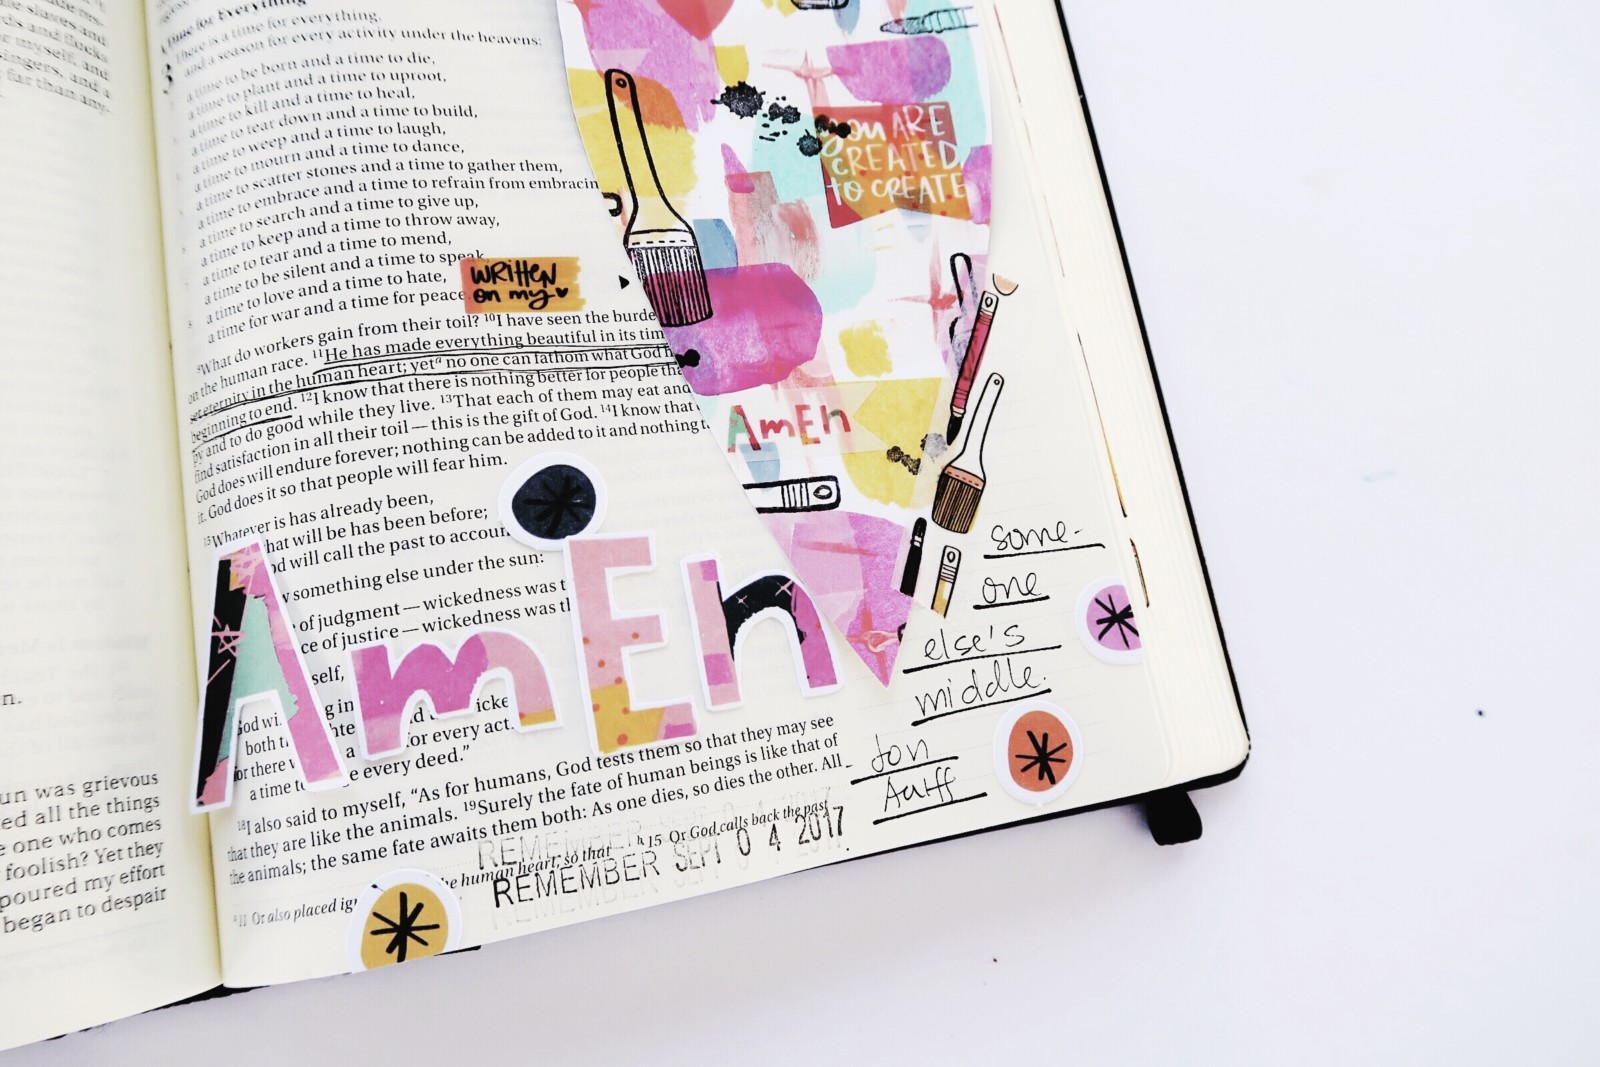 mixed media DIY Bible journaling tip-in by Jillian Ungerbuehler | Created to Create week 3 | process video